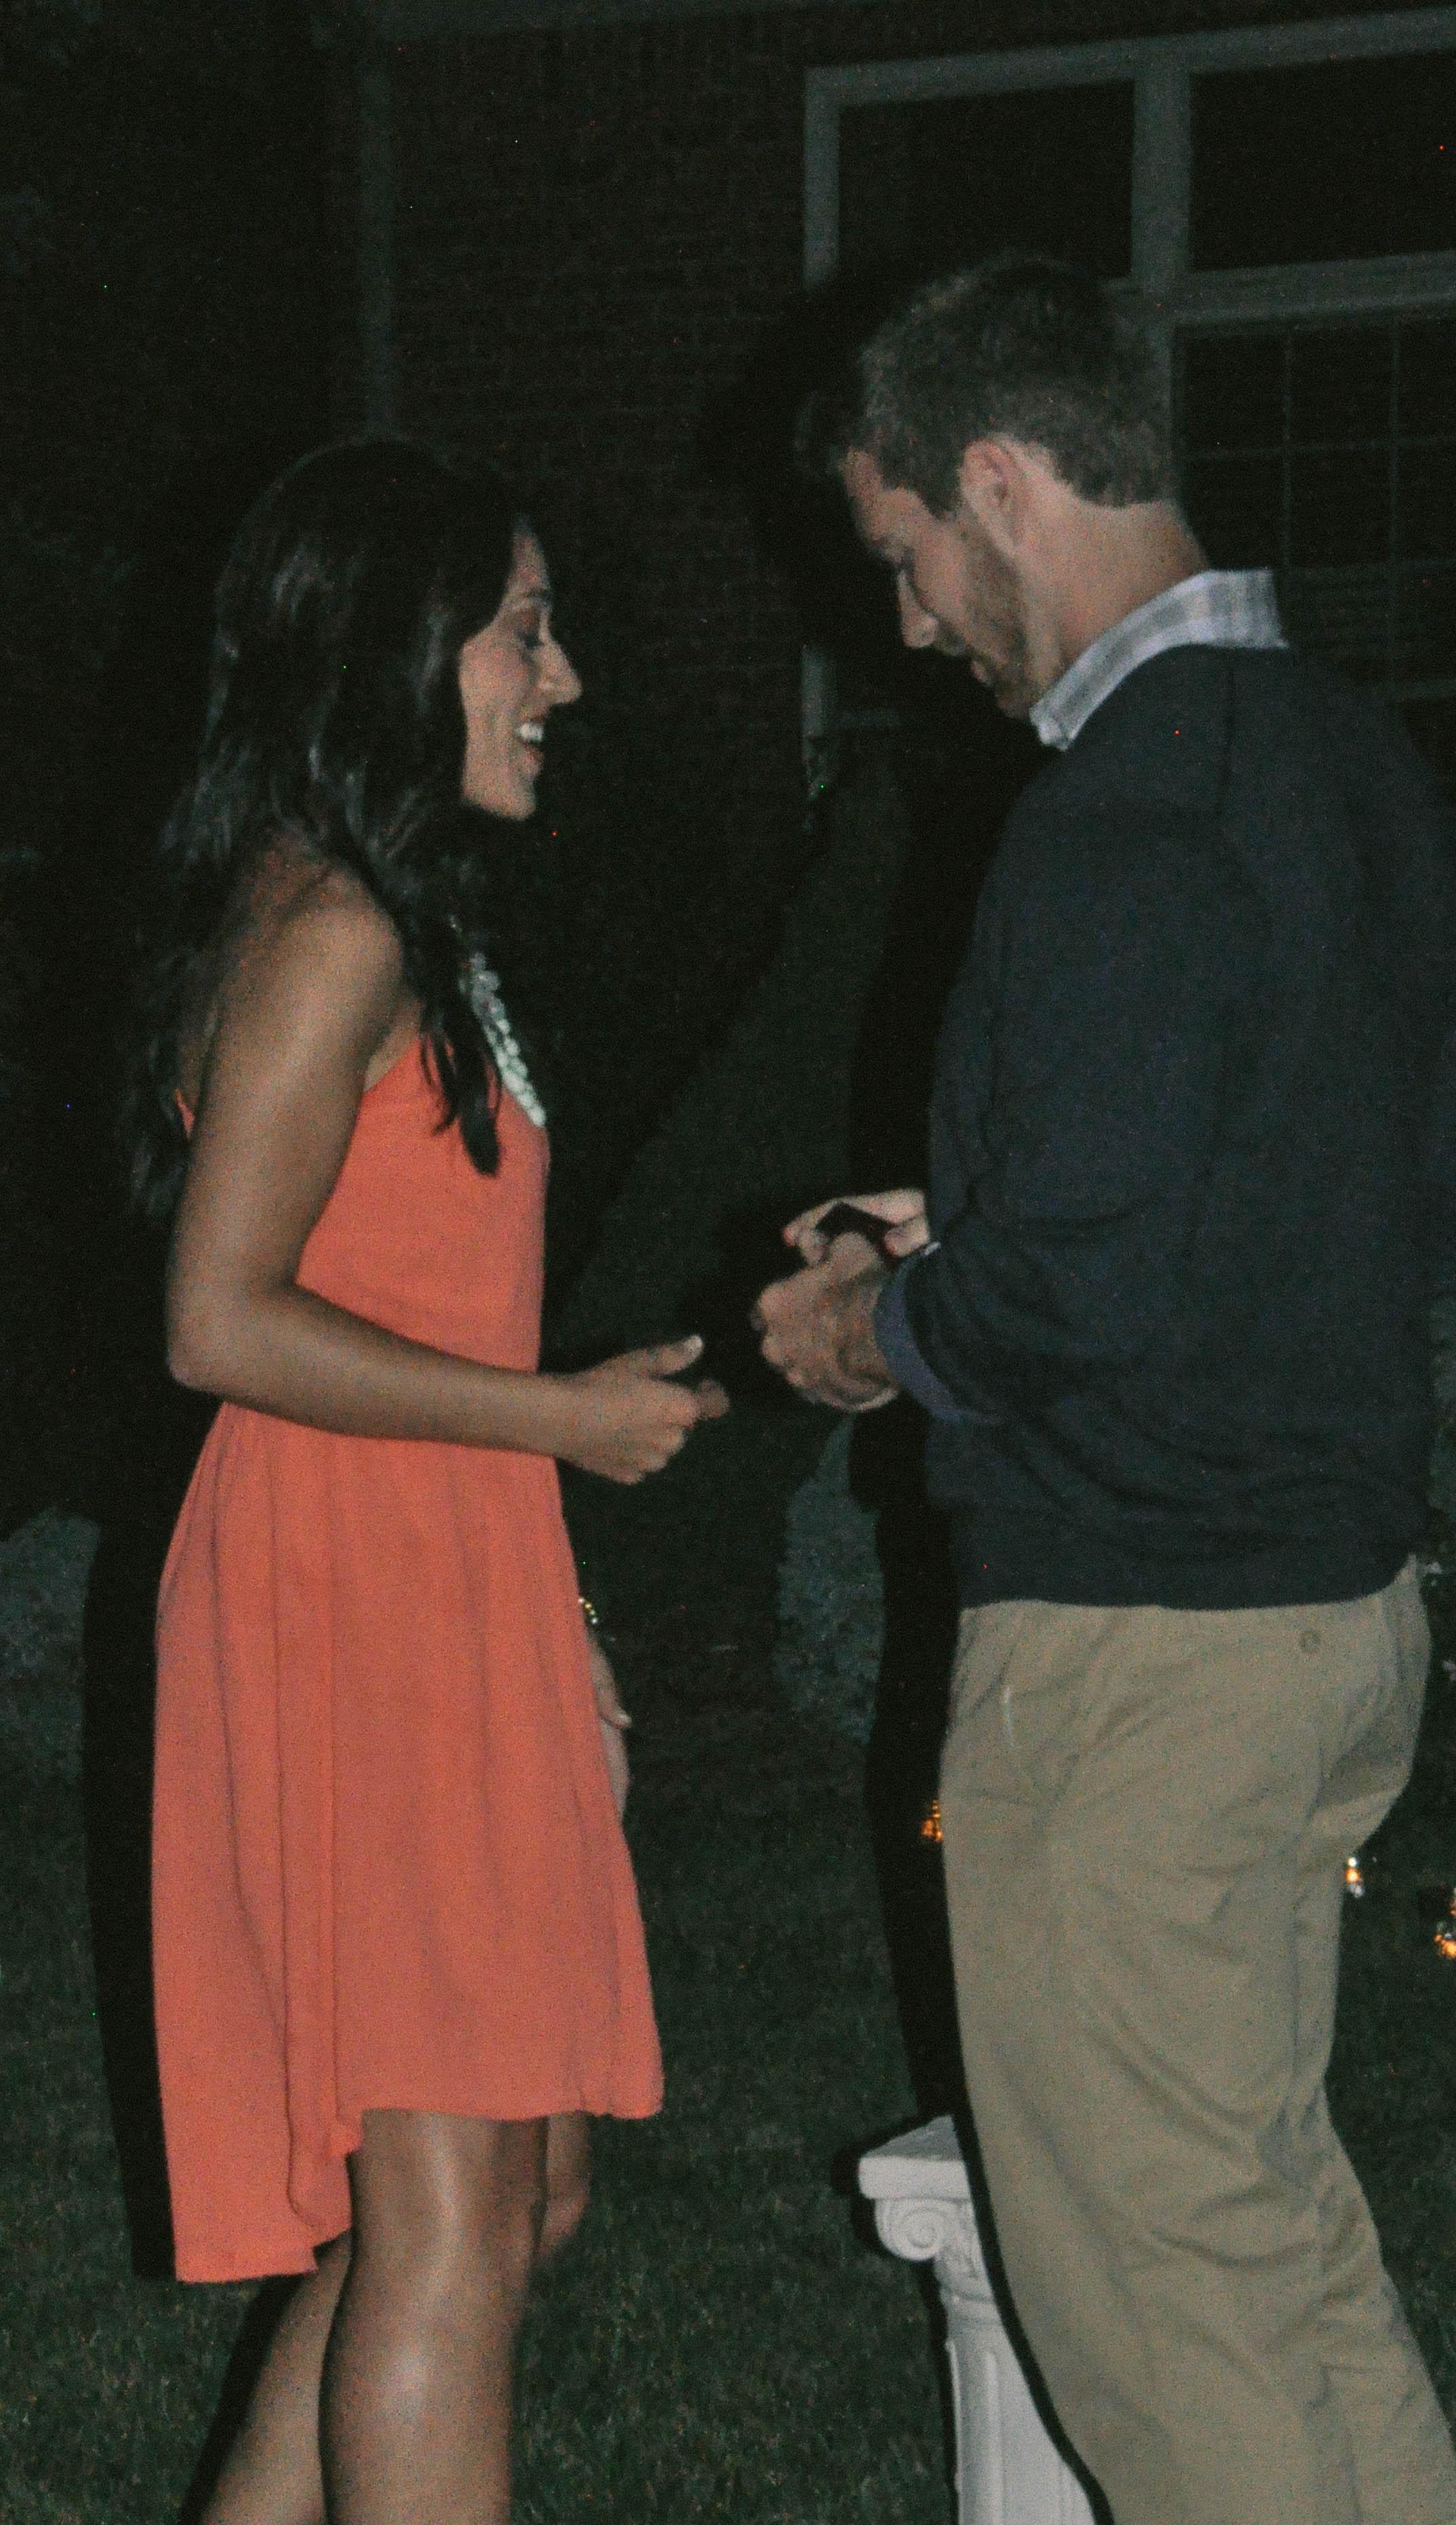 Scavenger_Hunt_Marriage_Proposal_DSC_0318